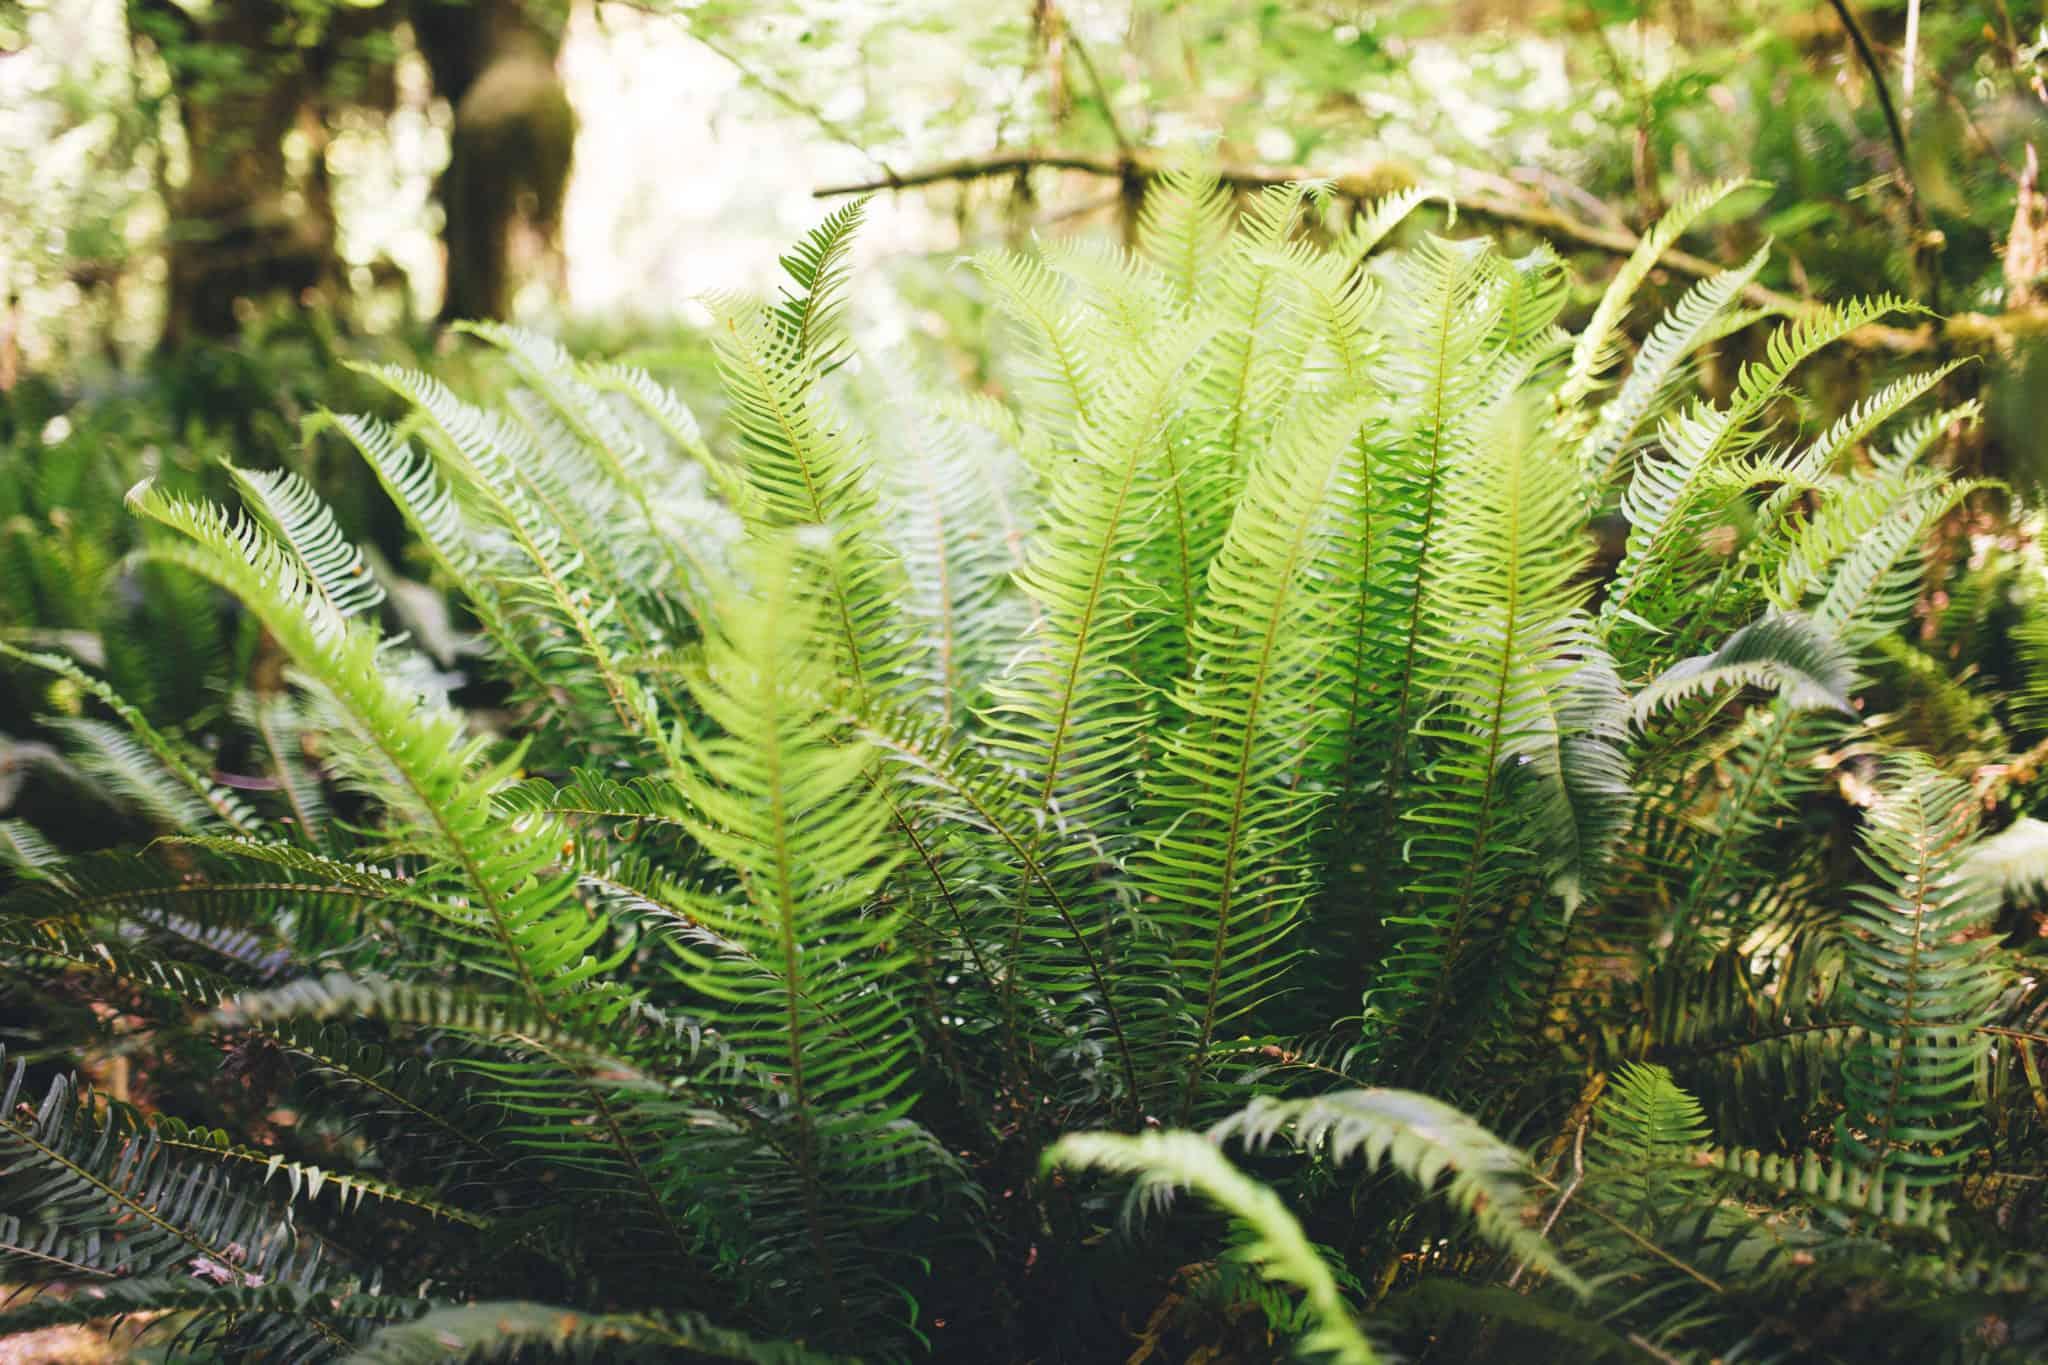 Olympic Peninsula Road Trip - Hoh Rainforest